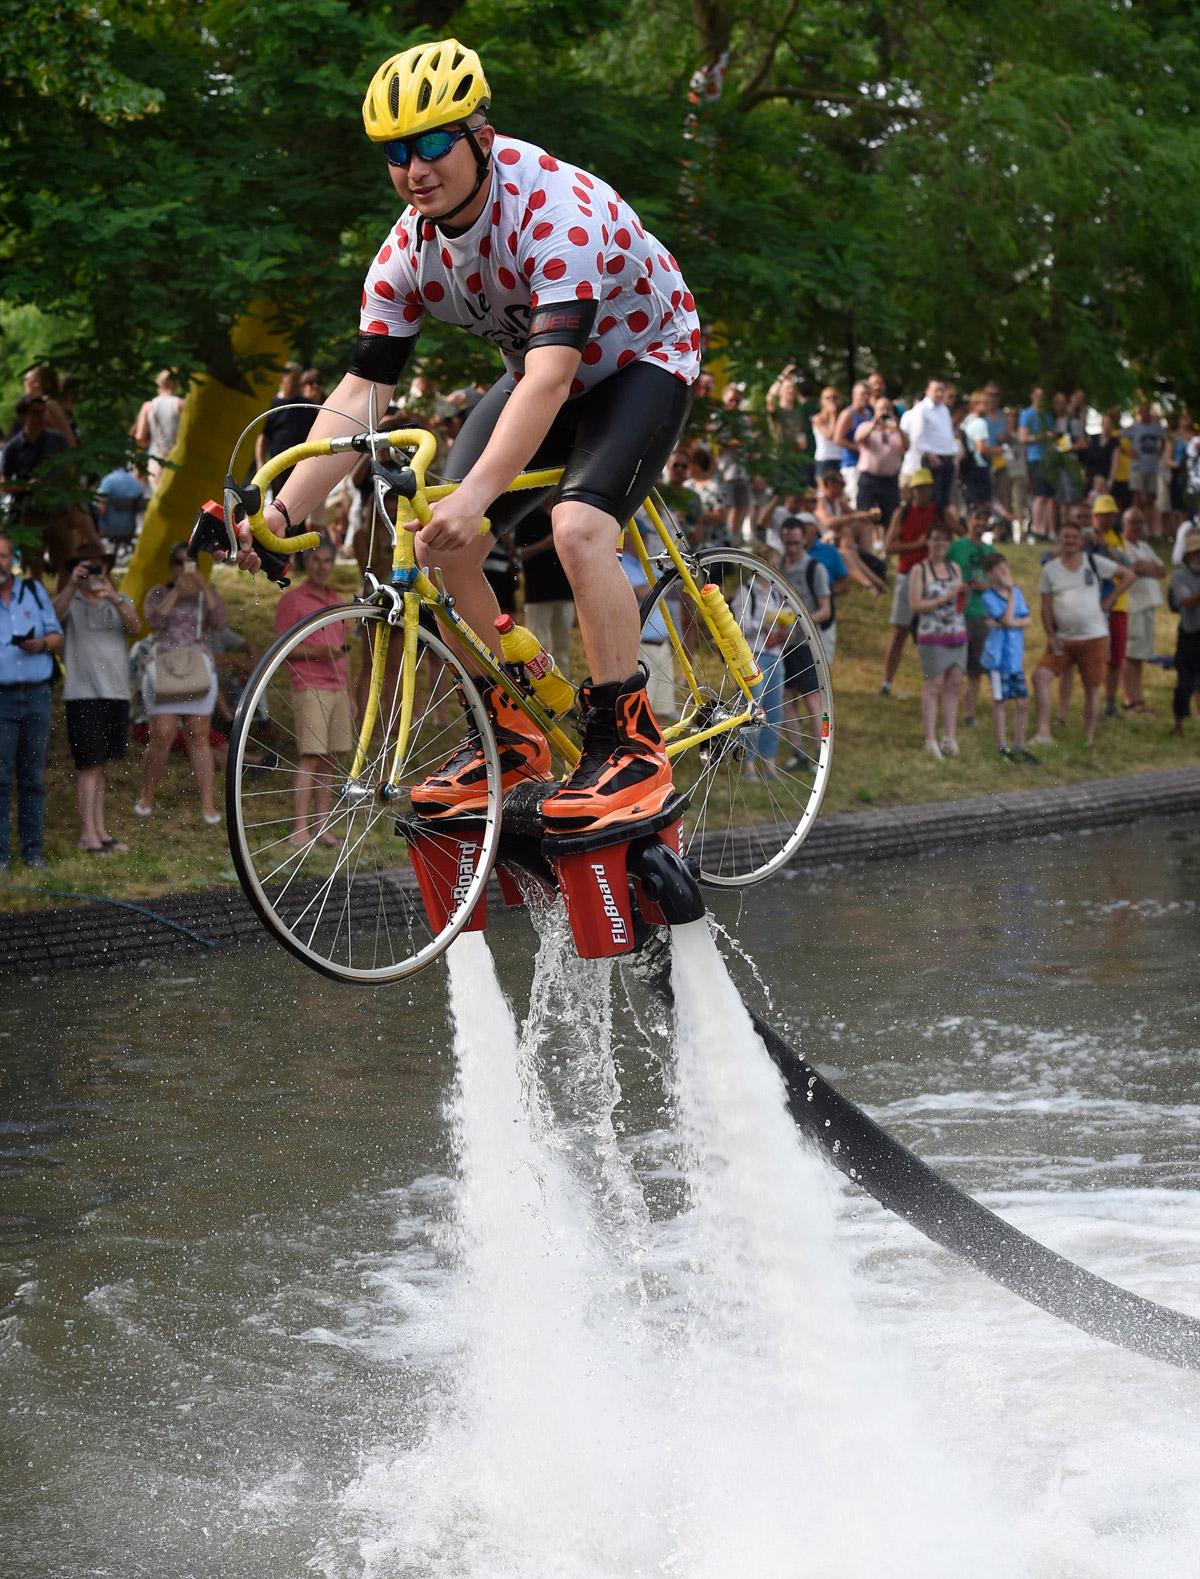 Kein Motordoping! (Foto: Roth&Roth roth-foto.de)